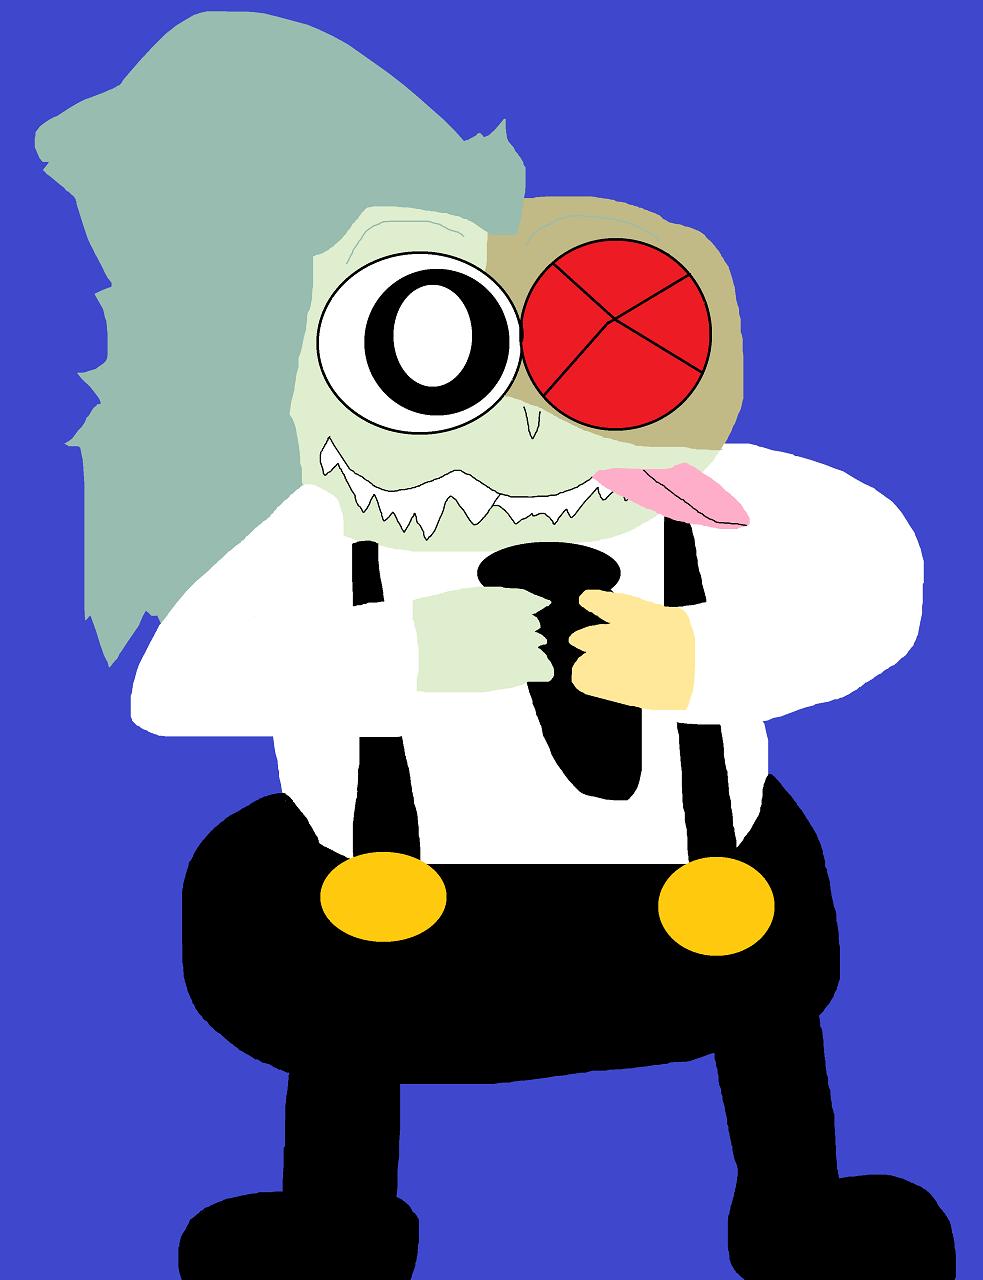 Just A Random Goofy Looking Boxman by Falconlobo